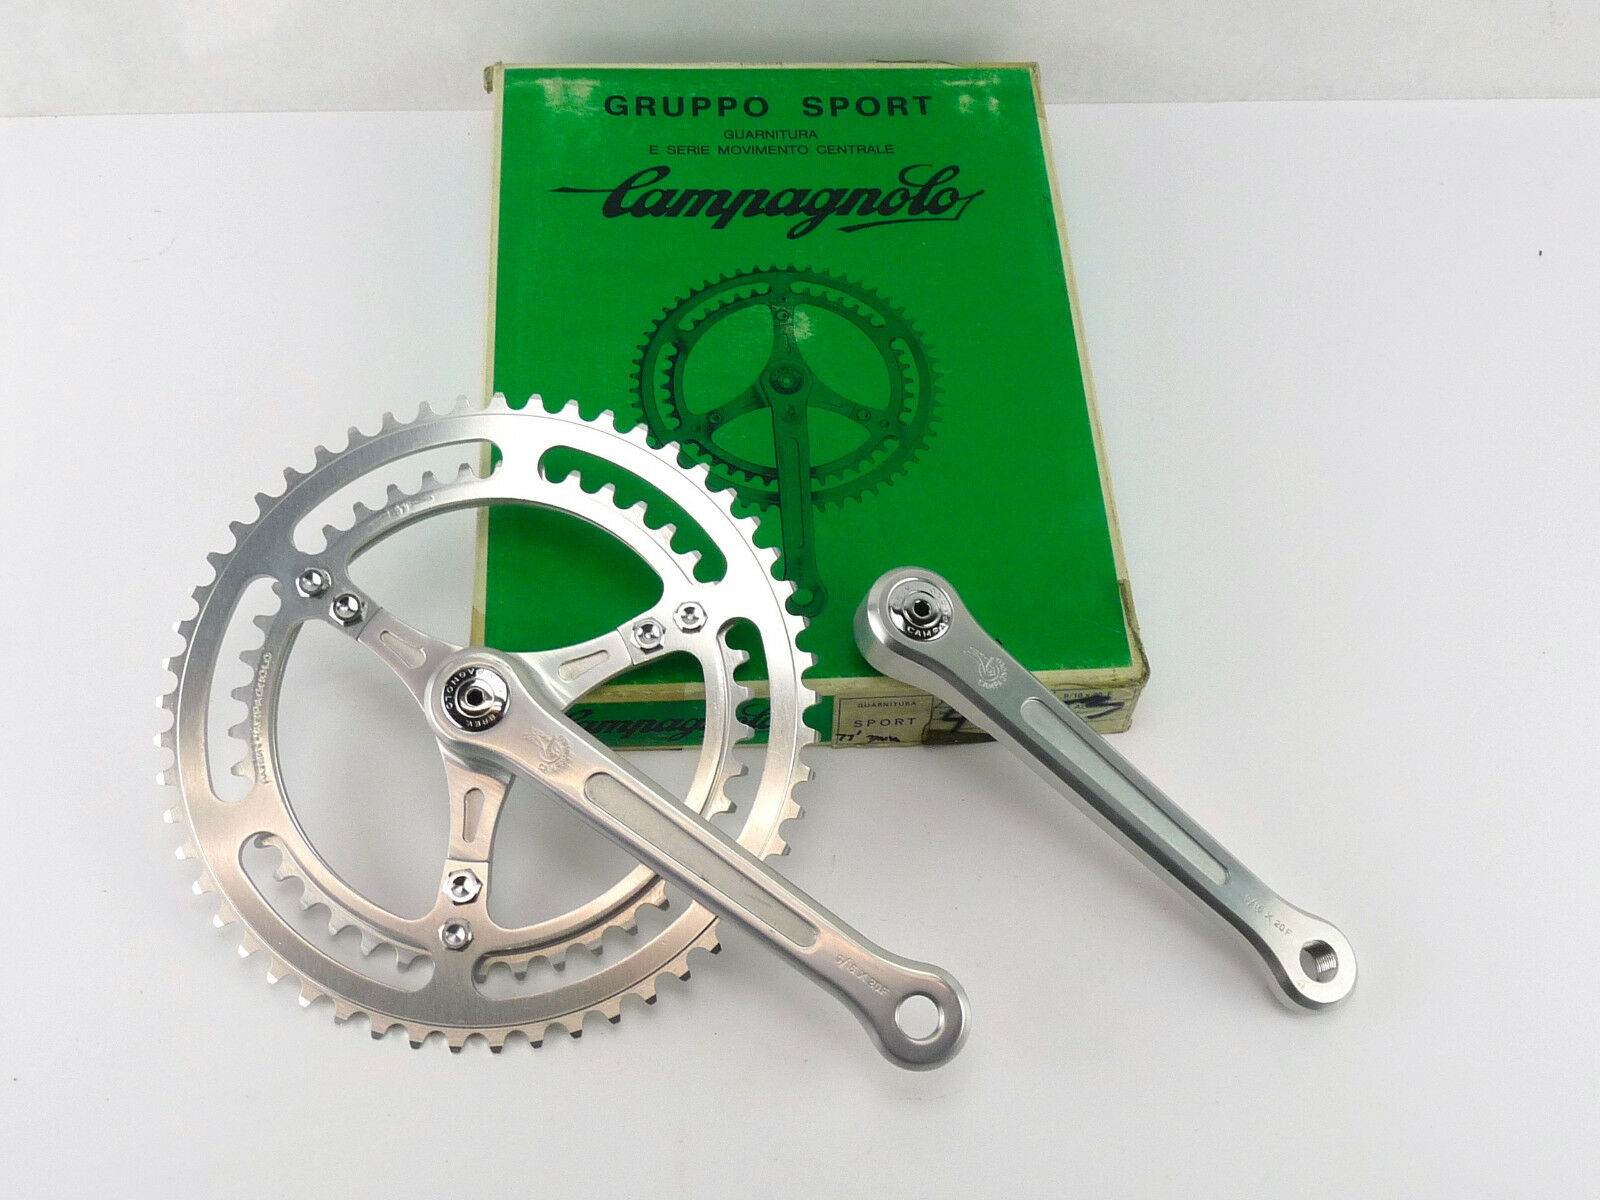 Campagnolo Crankset Gran Sport 170mm 3Arm 53-42 Chainrings 1977 Bike NOS